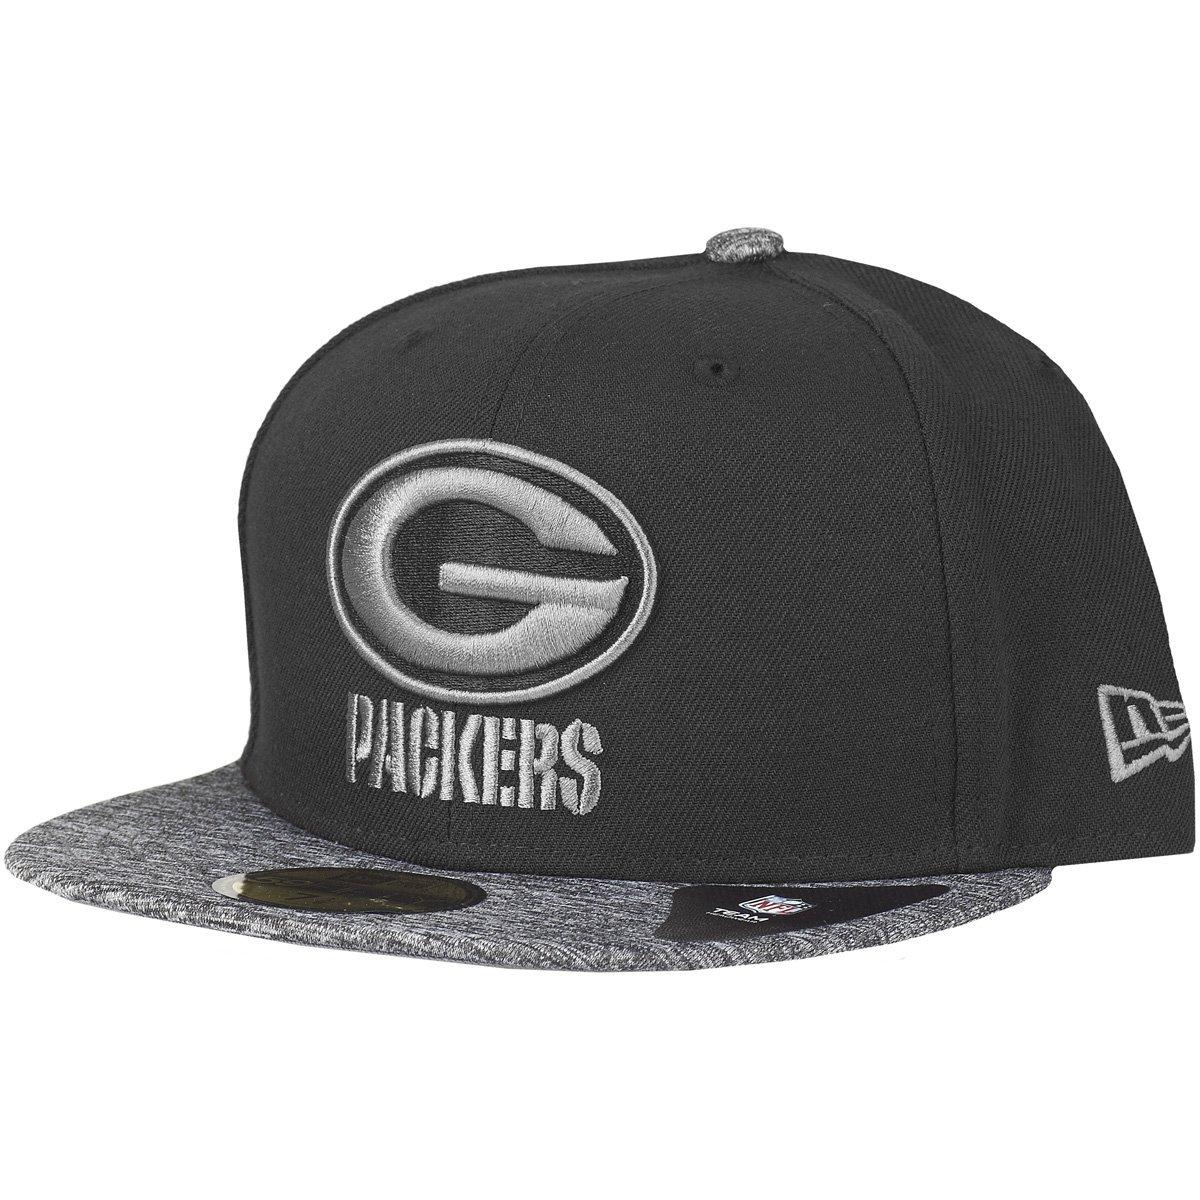 Graphite Green Bay Packers New Era 59Fifty Cap